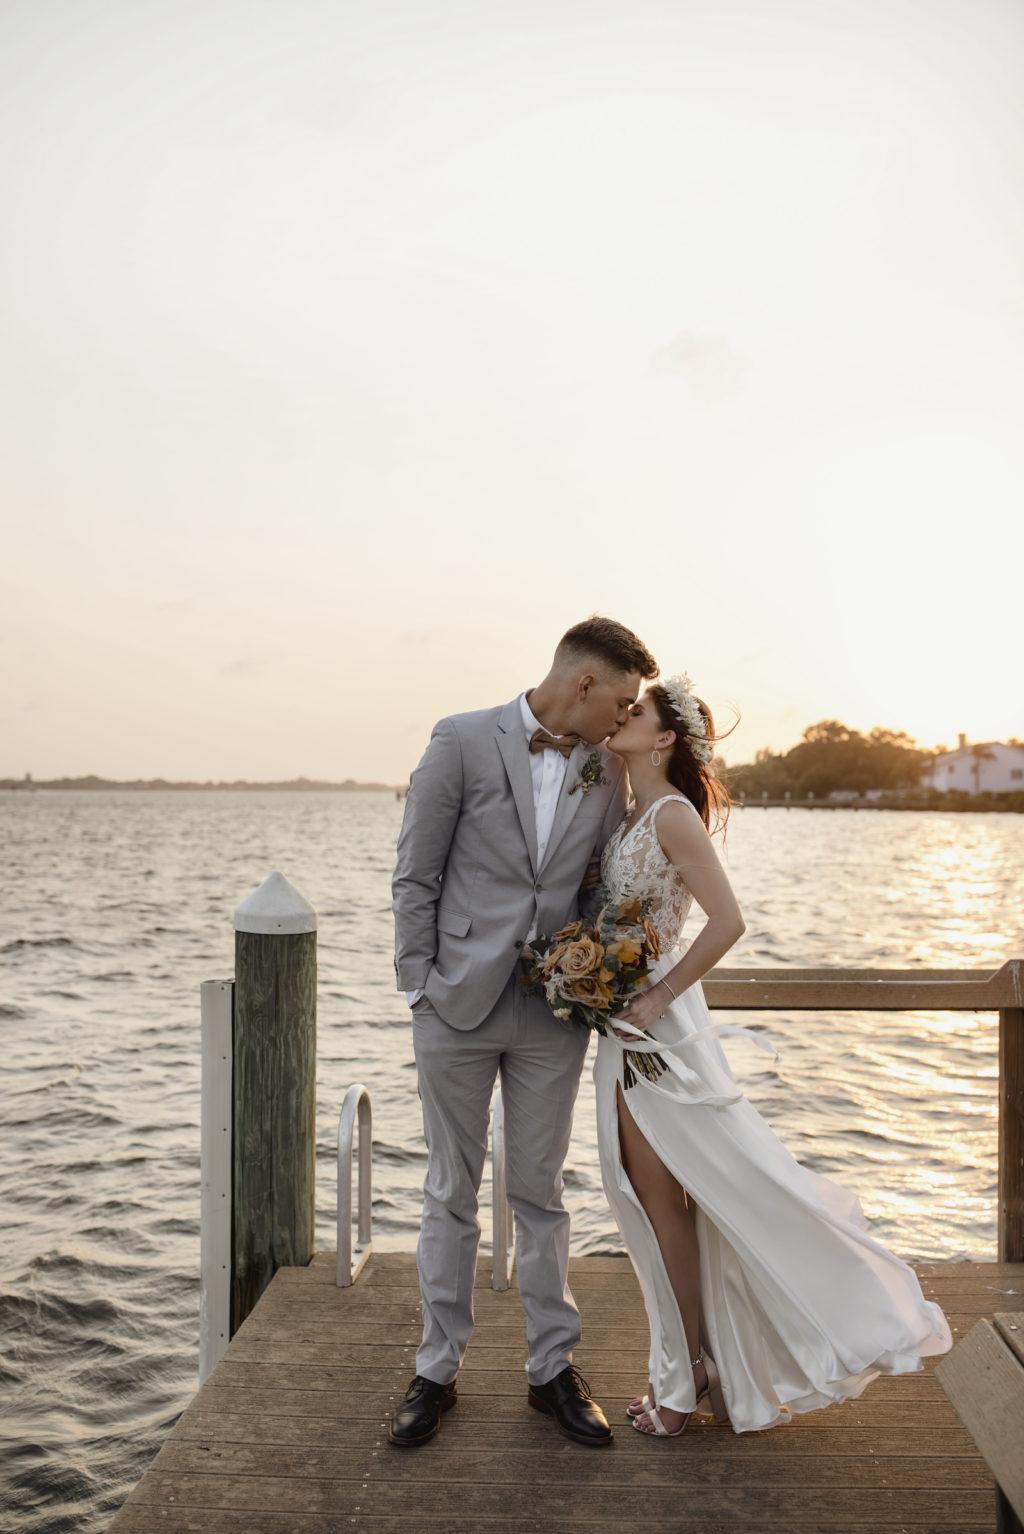 Boho Bride and Groom Sunset Wedding Portrait   Sarasota Waterfront Wedding Venue   Planner Kelly Kennedy Weddings and Events   Photographer Alisa Sue Photography